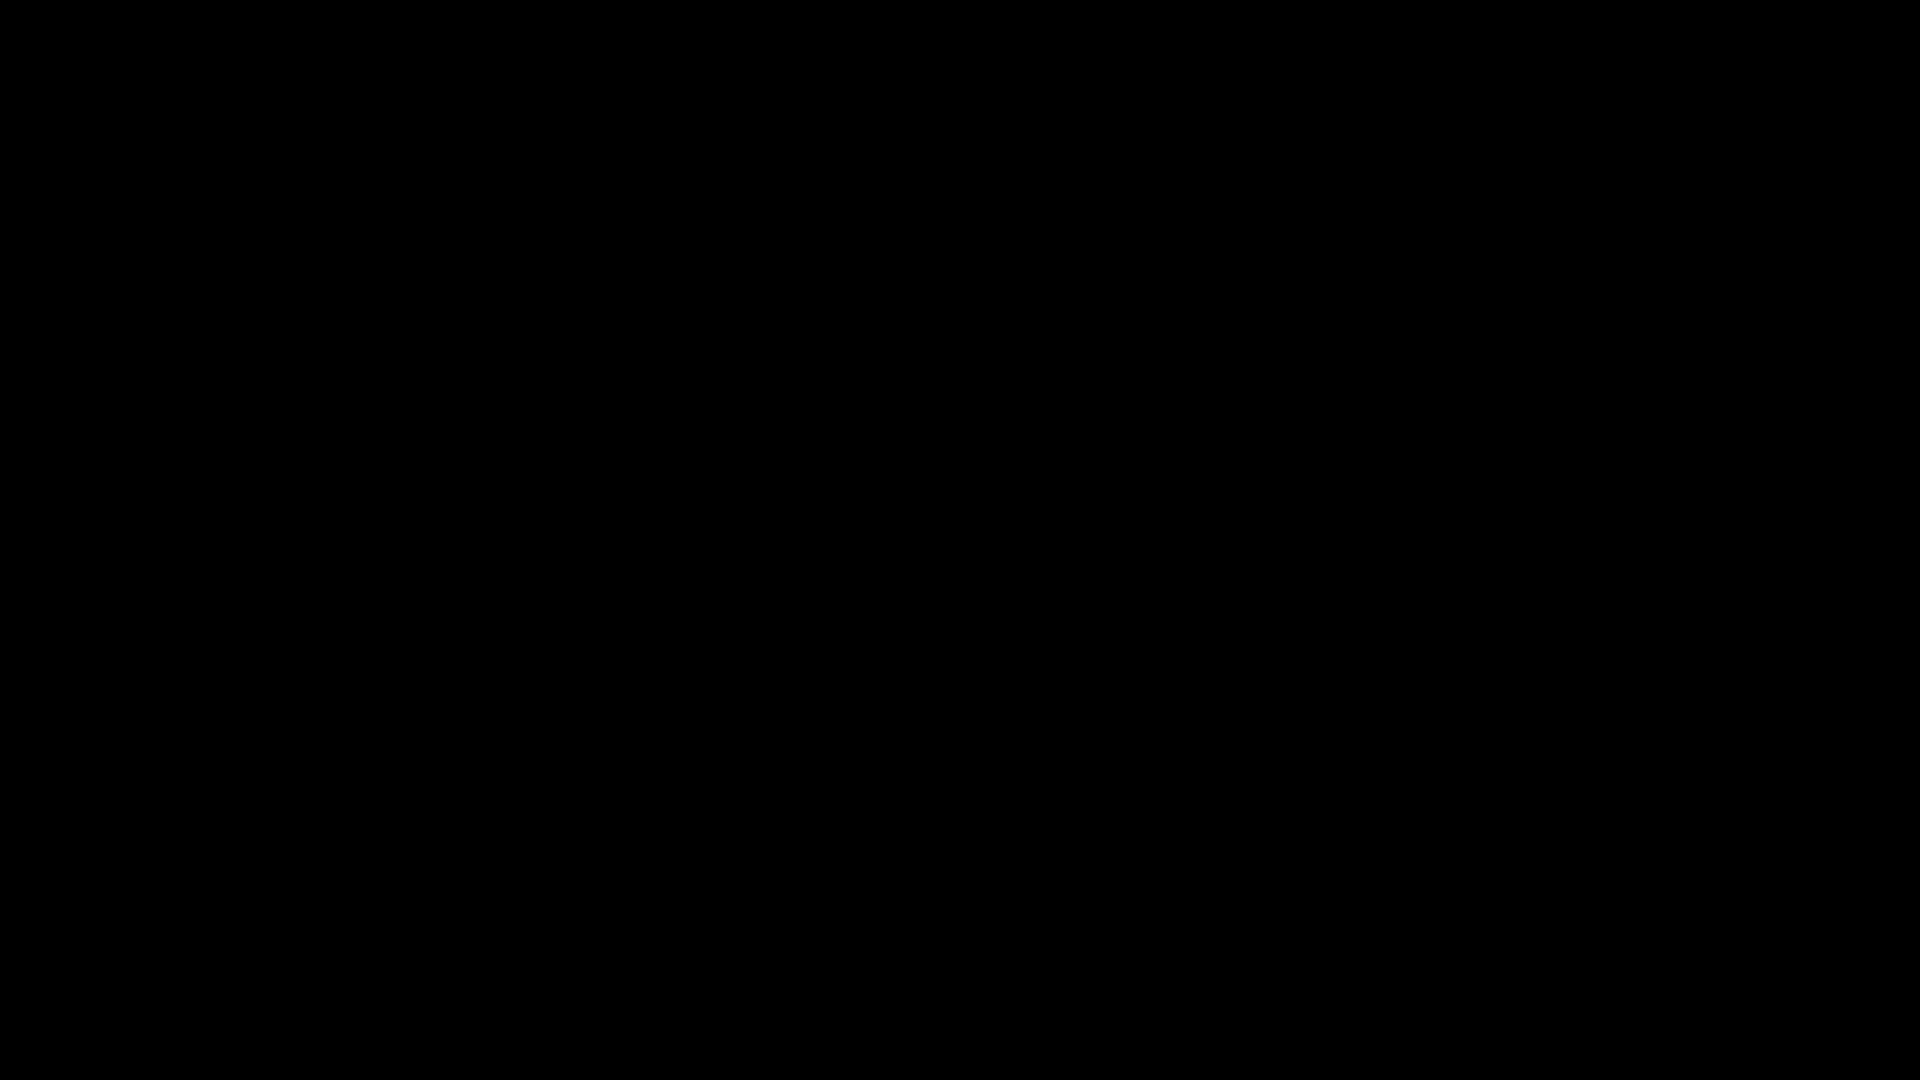 O. TWO 。 O 虐待送料 12 色マット液体口紅簡単に着色リップグロス送料無料